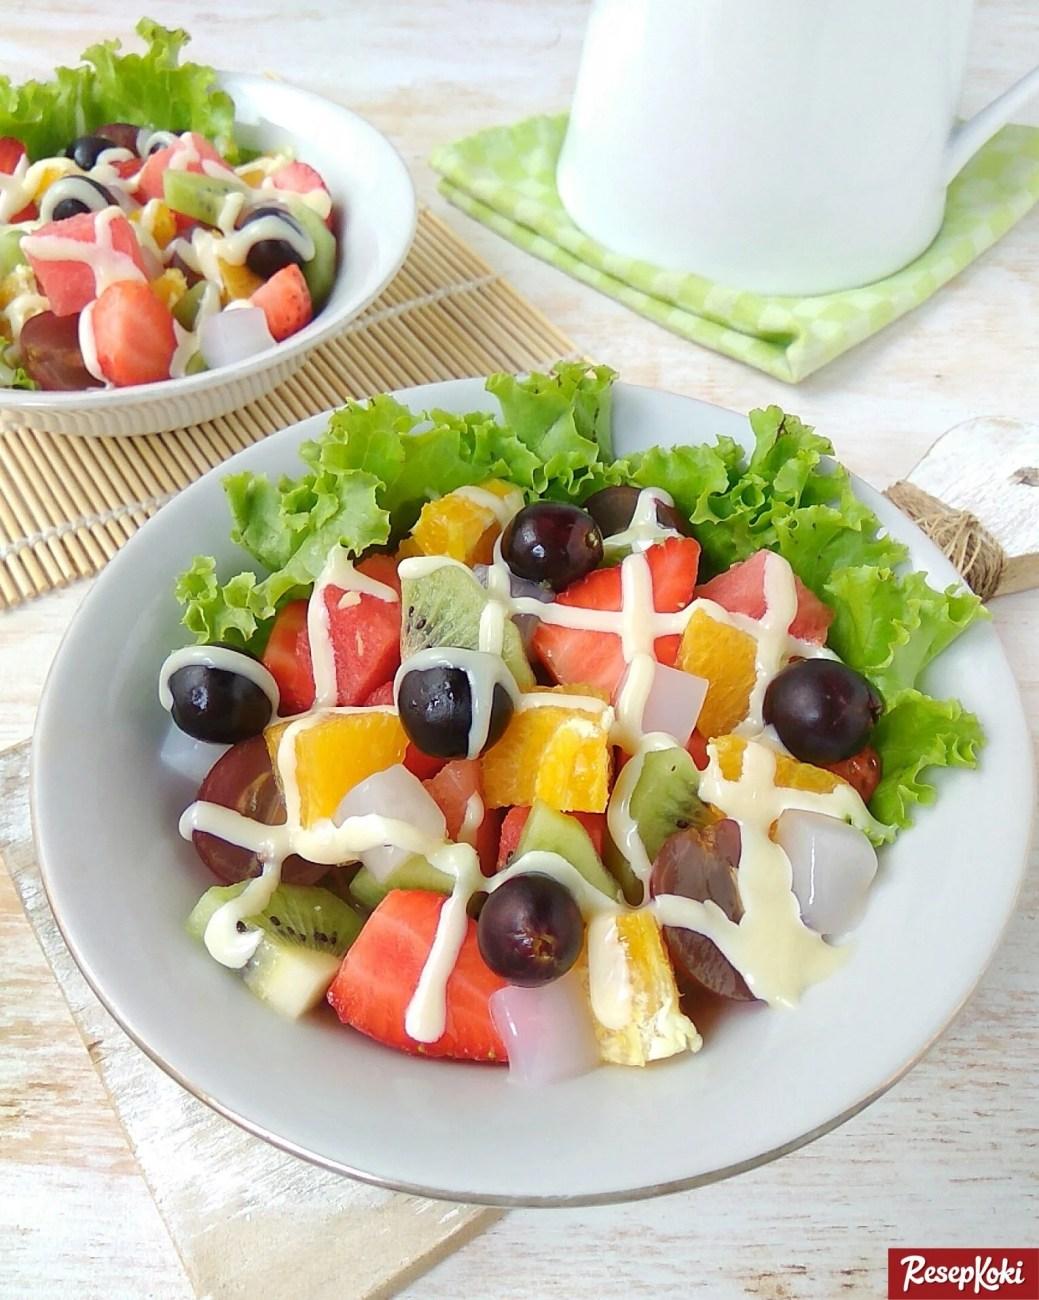 Resep Salad Buah Sederhana : resep, salad, sederhana, Salad, (Fruit), Segar, Siram, Mayones, Resep, ResepKoki